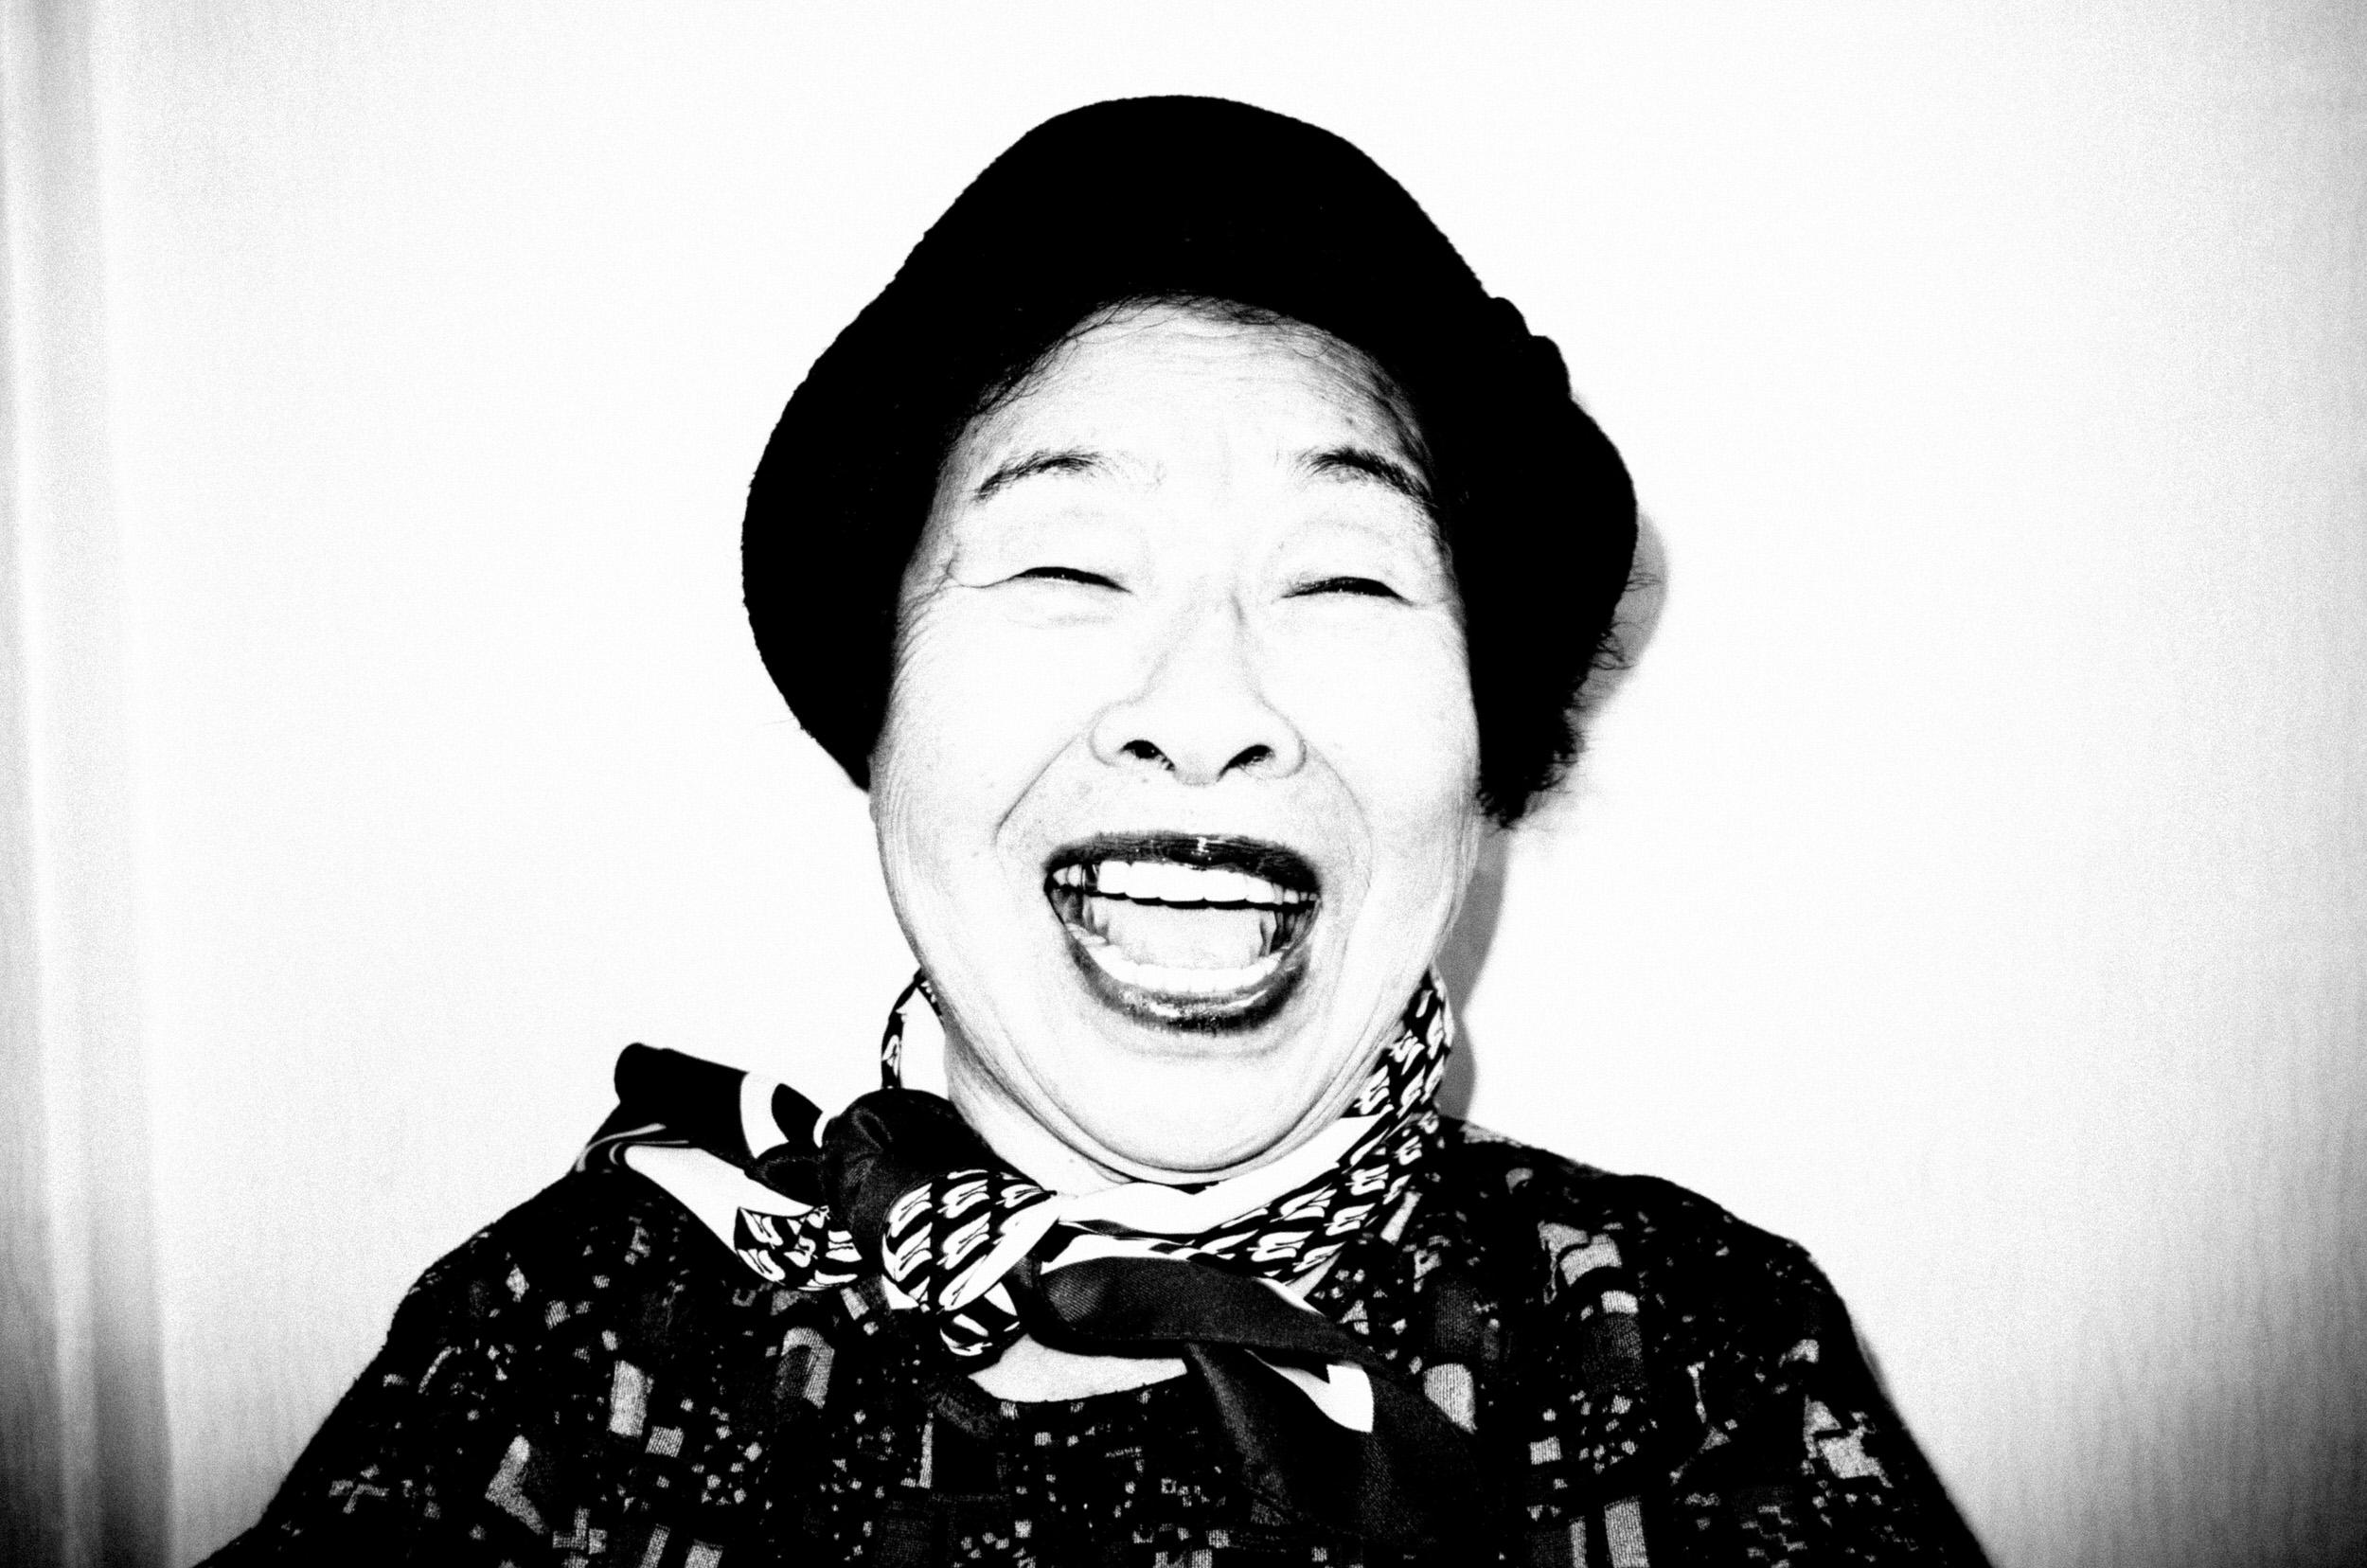 halmunee-grandma-eric kim photography seoul-0003562-2.jpg